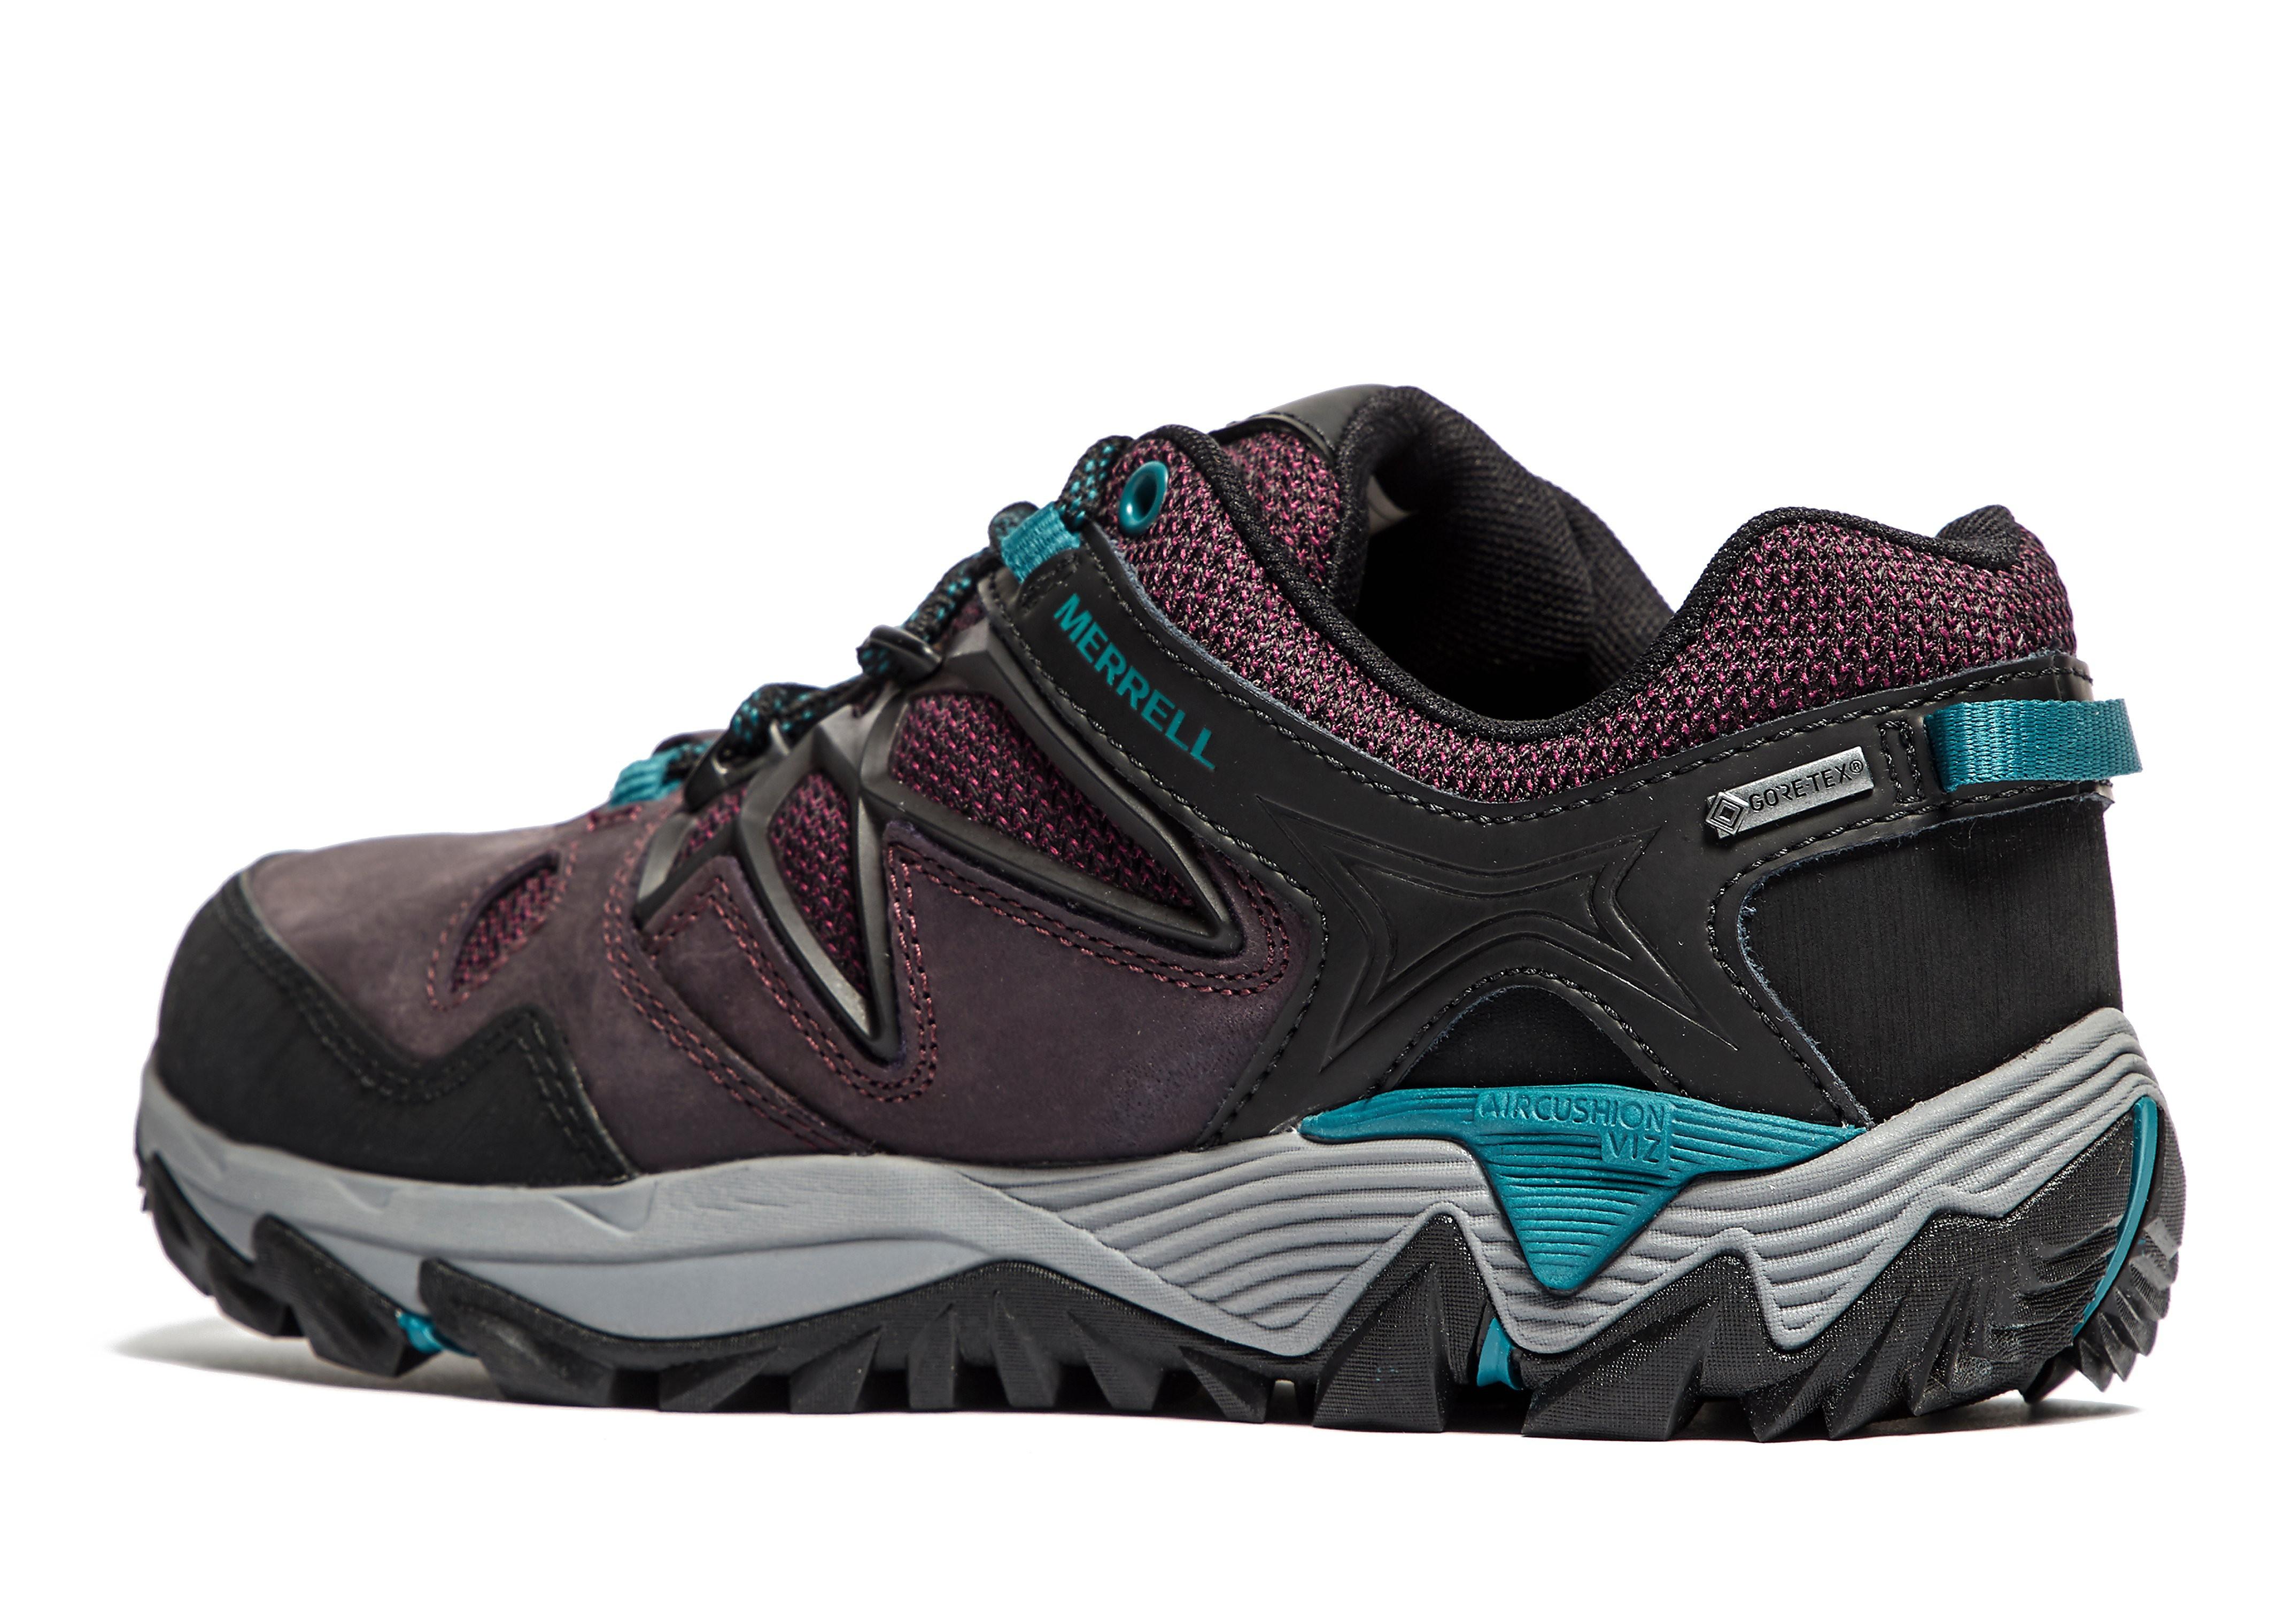 Merrell All Out Blaze 2 GTX Walking Shoe Women's